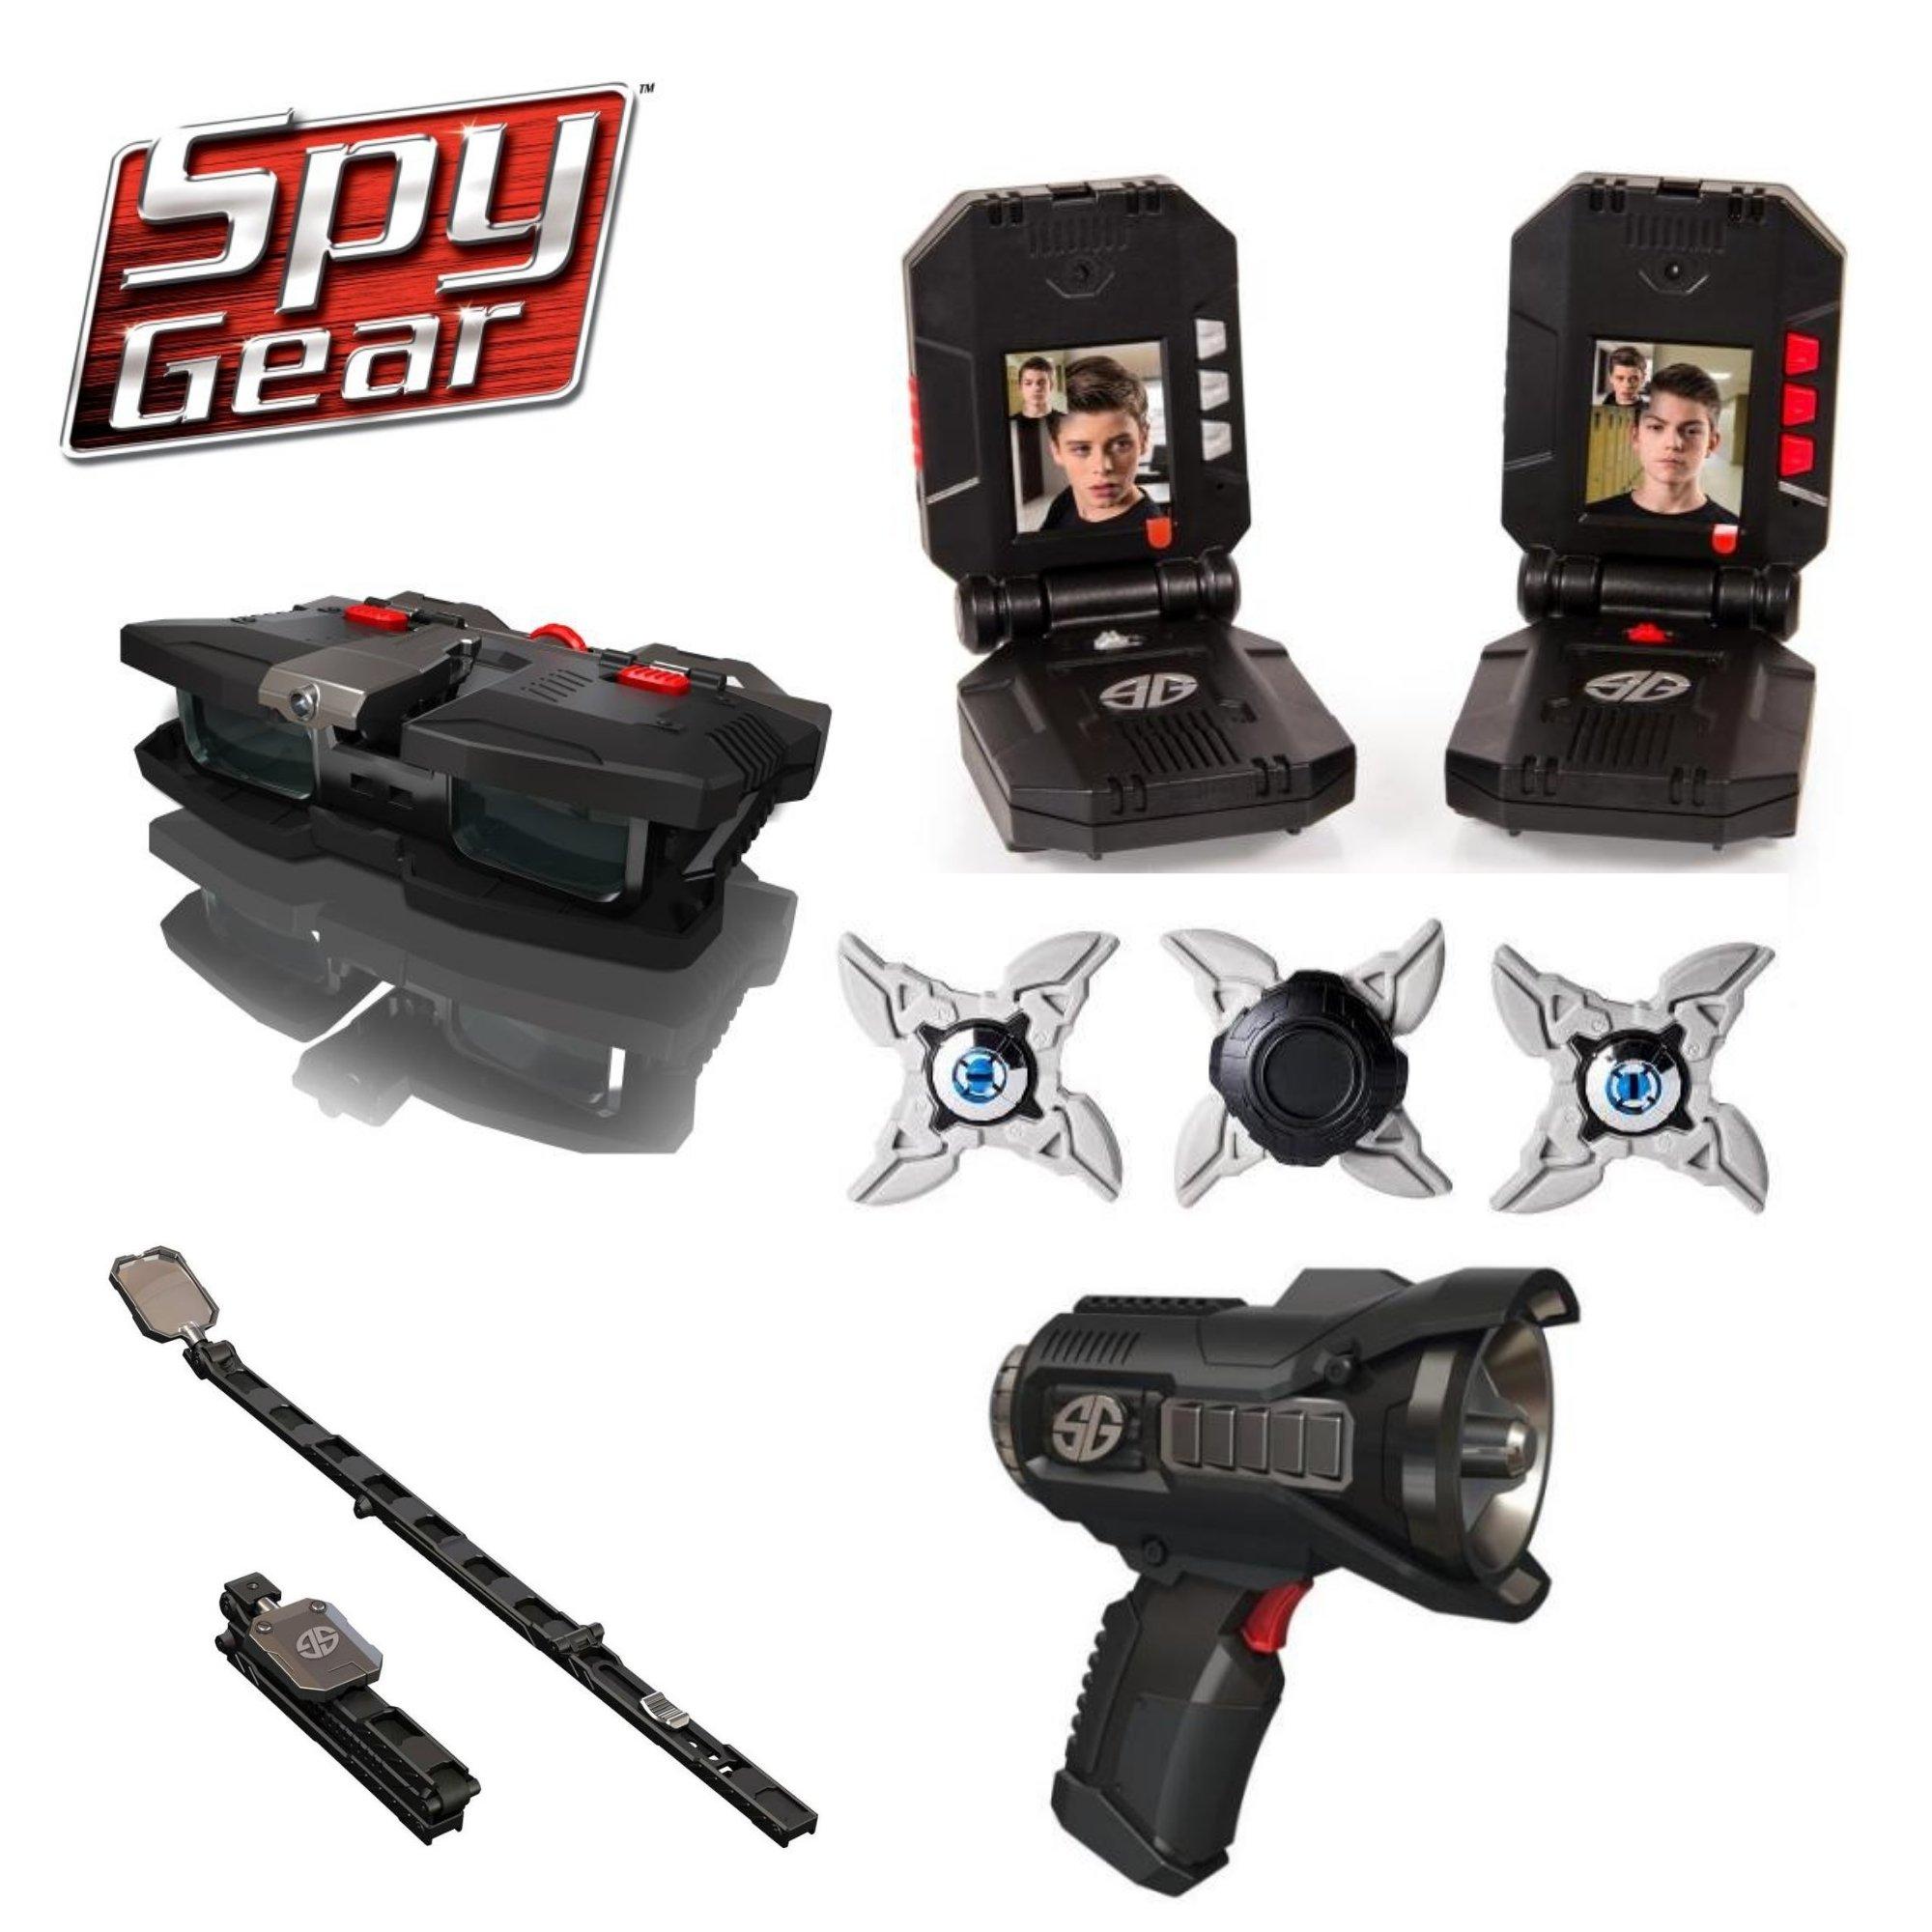 Spy Gear Alpha Mission Kit Ultimate Secret Agent Tool Bundle - Video Walkie Talkies, Night Scope, Voice Changer, Tactical Mirror & Ninja Stars